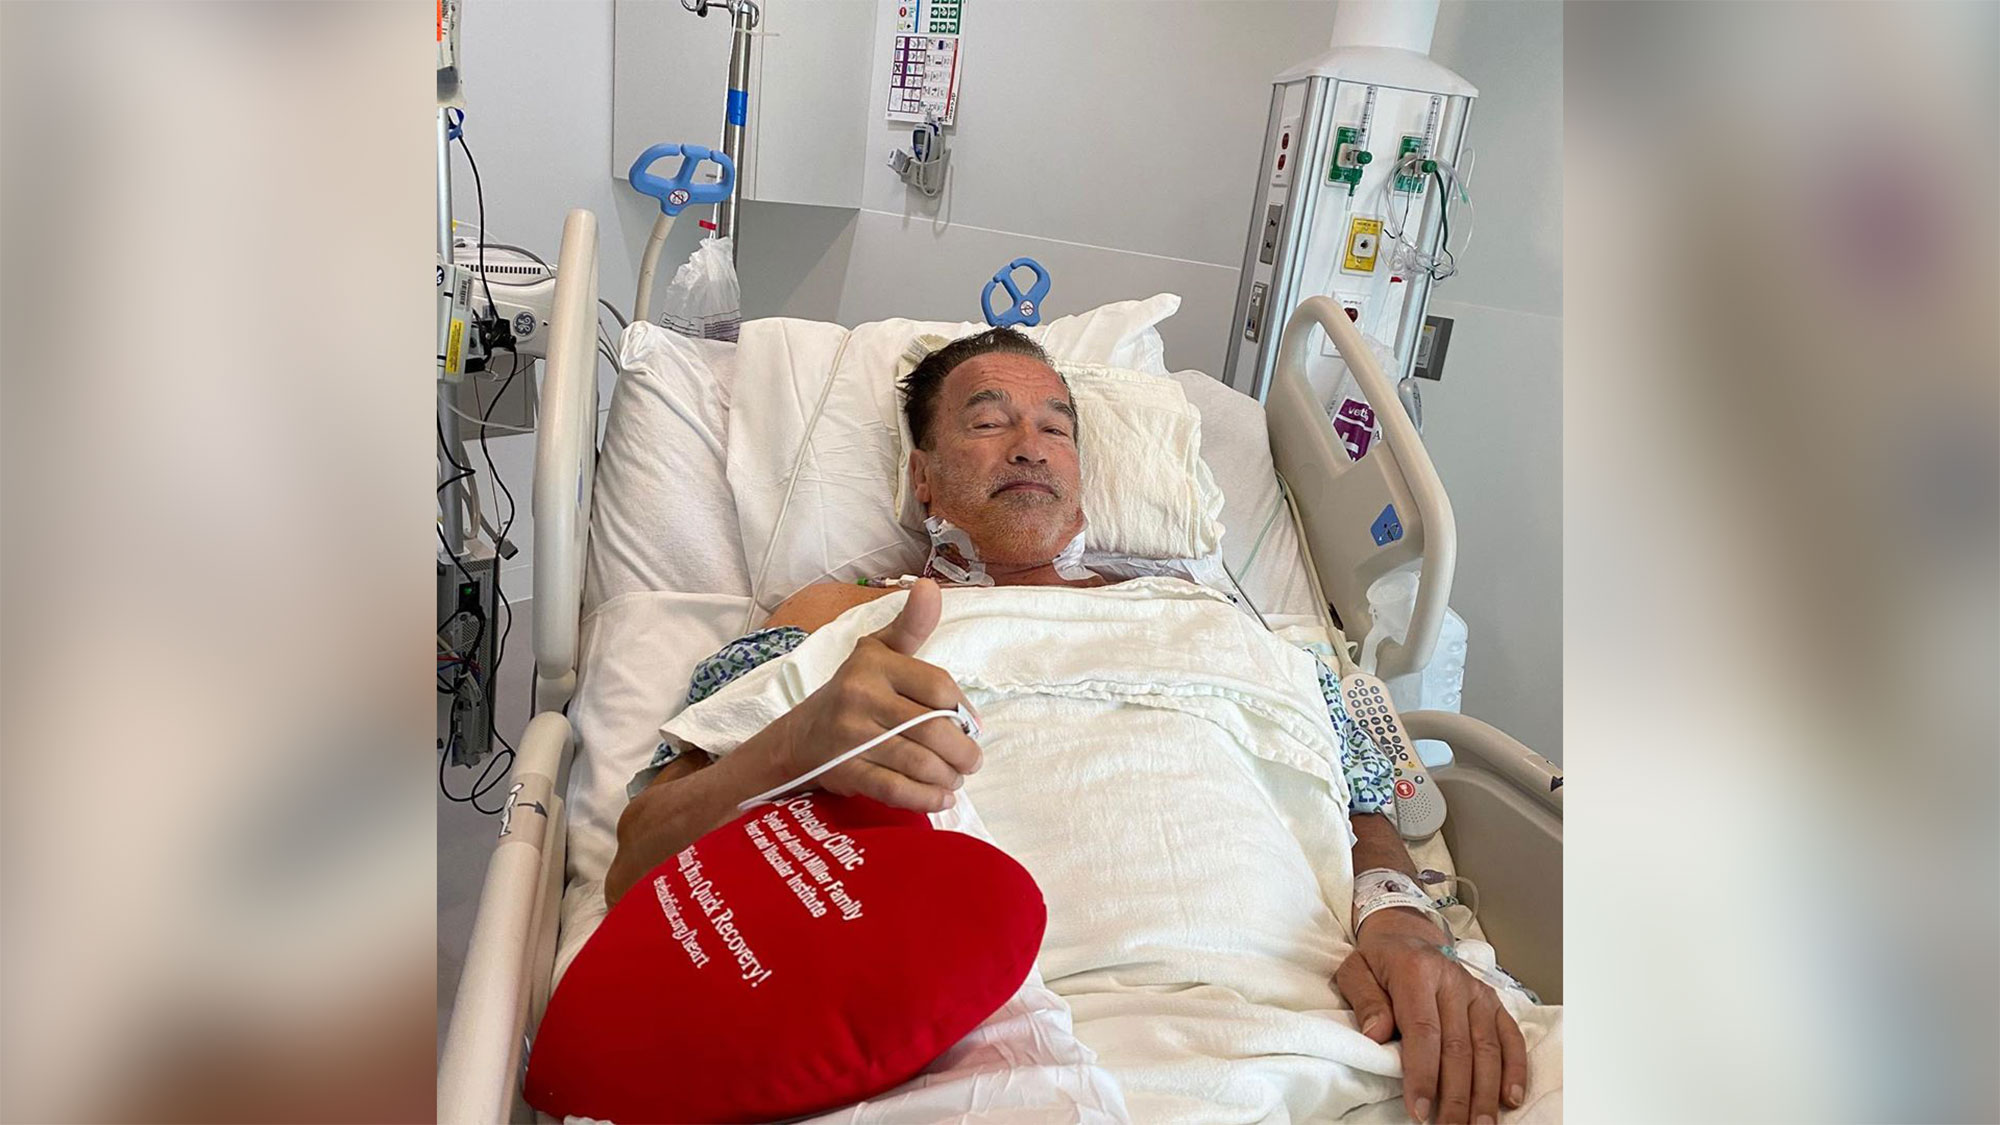 Arnold Schwarzenegger says he feels 'fantastic' after undergoing heart surgery